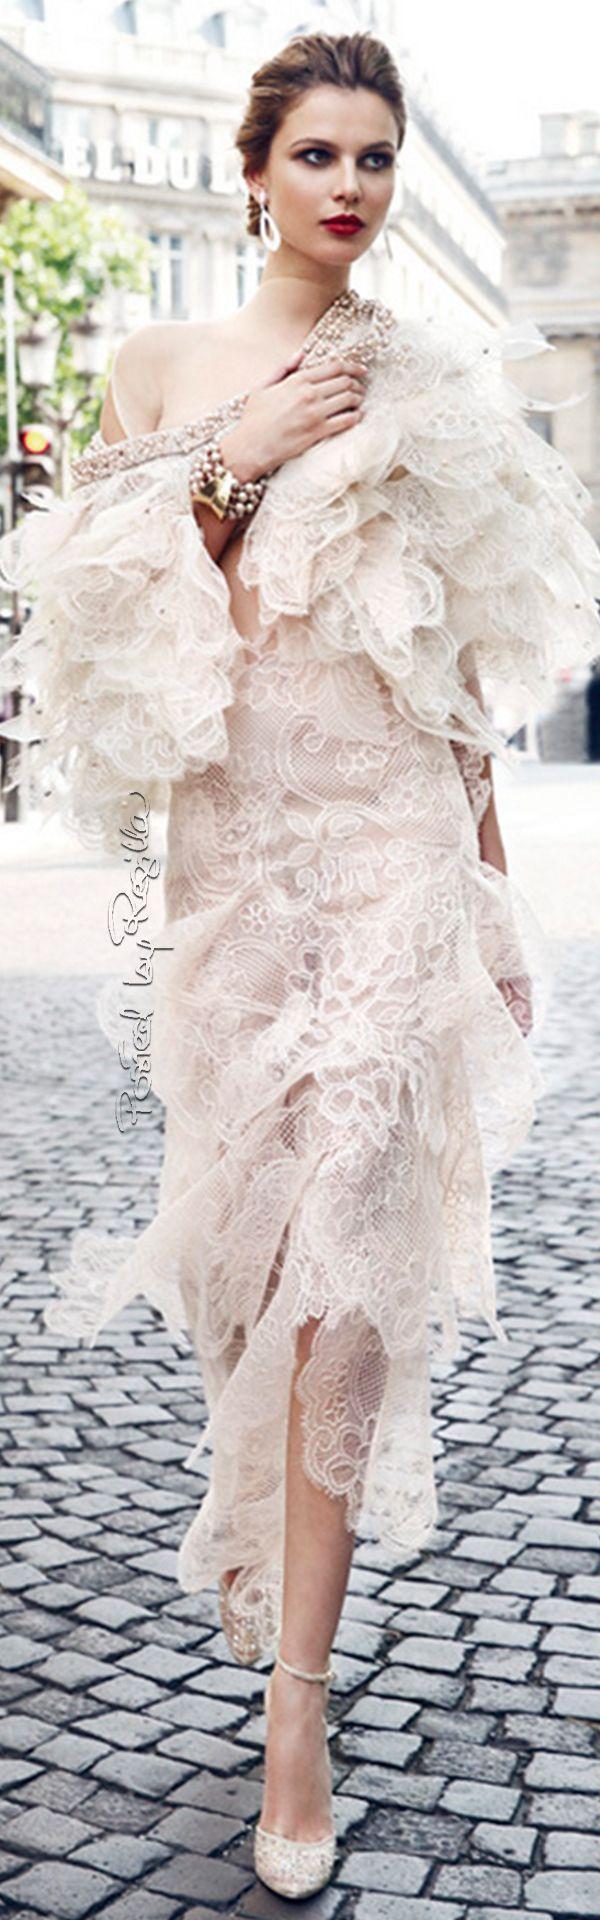 Wedding - Stylish Dress